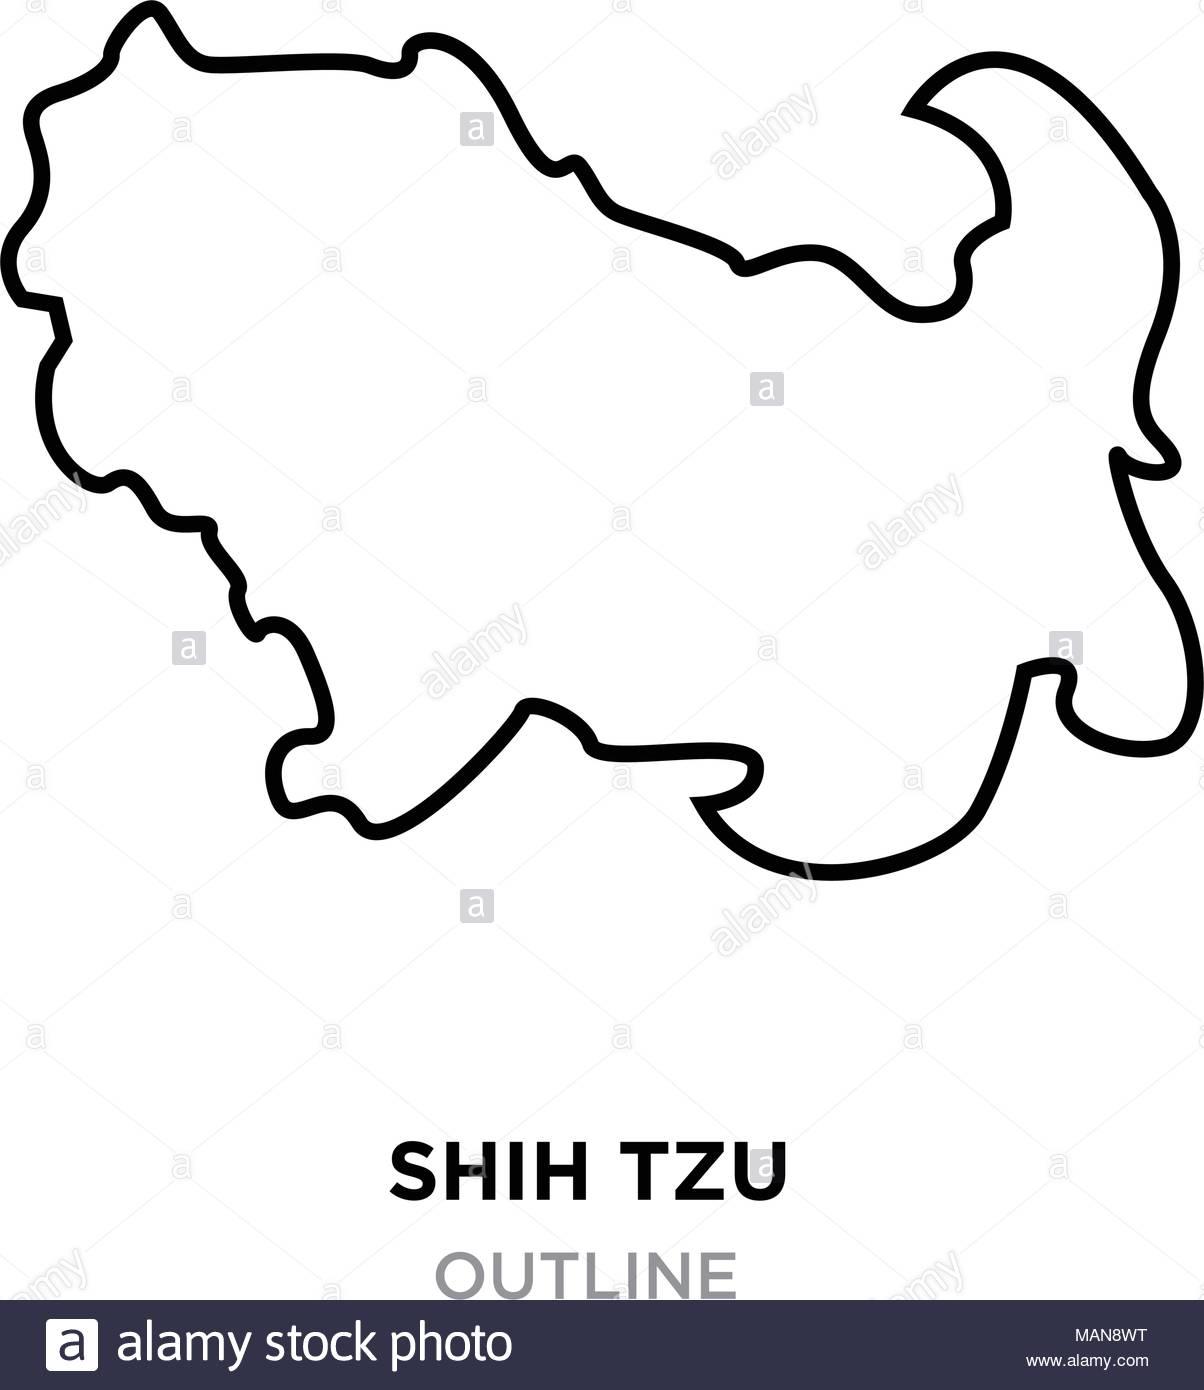 1204x1390 Shih Tzu Silhouette Stock Photos Amp Shih Tzu Silhouette Stock